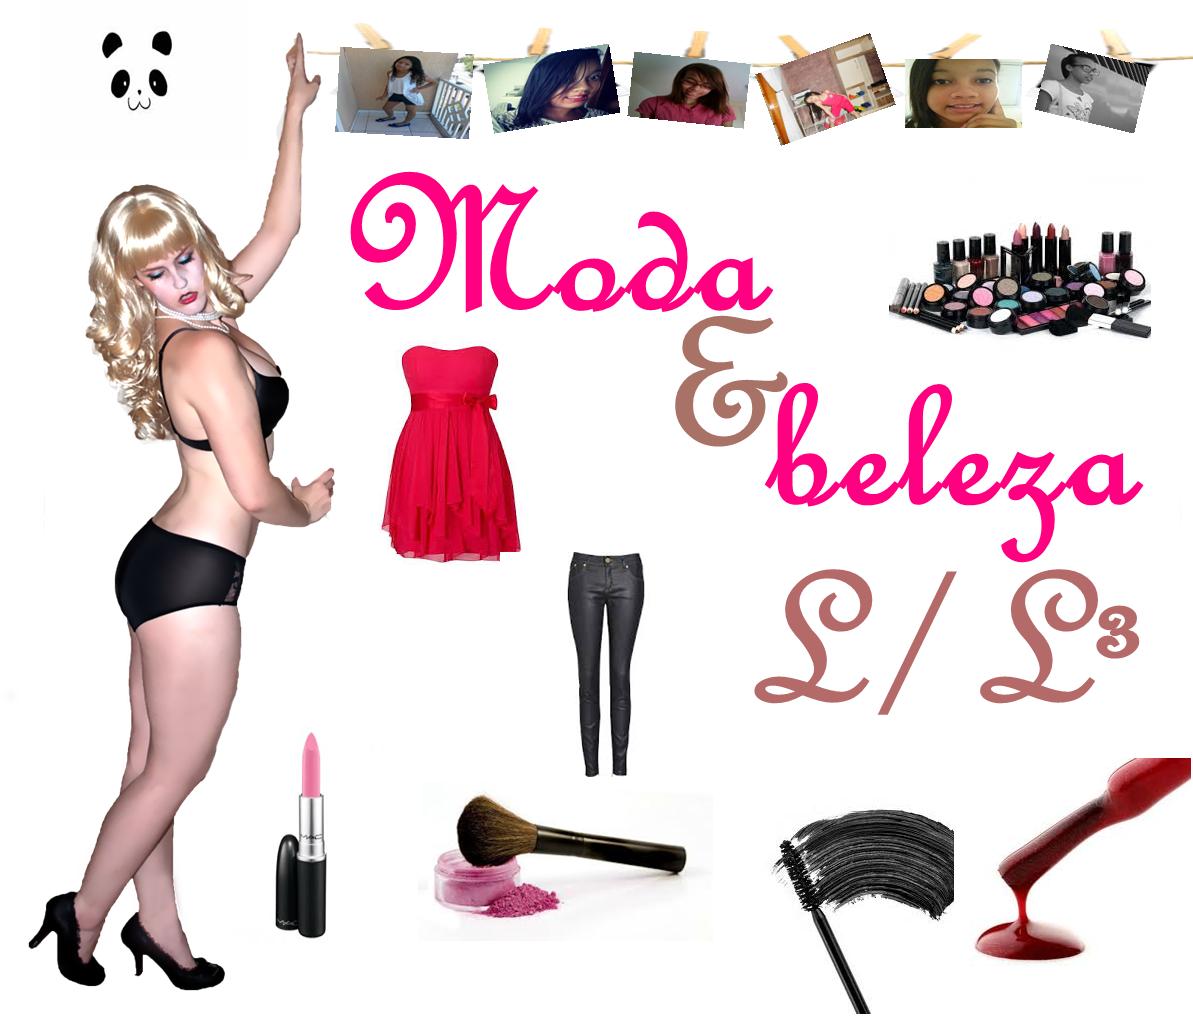 Moda&BelezaLL&L